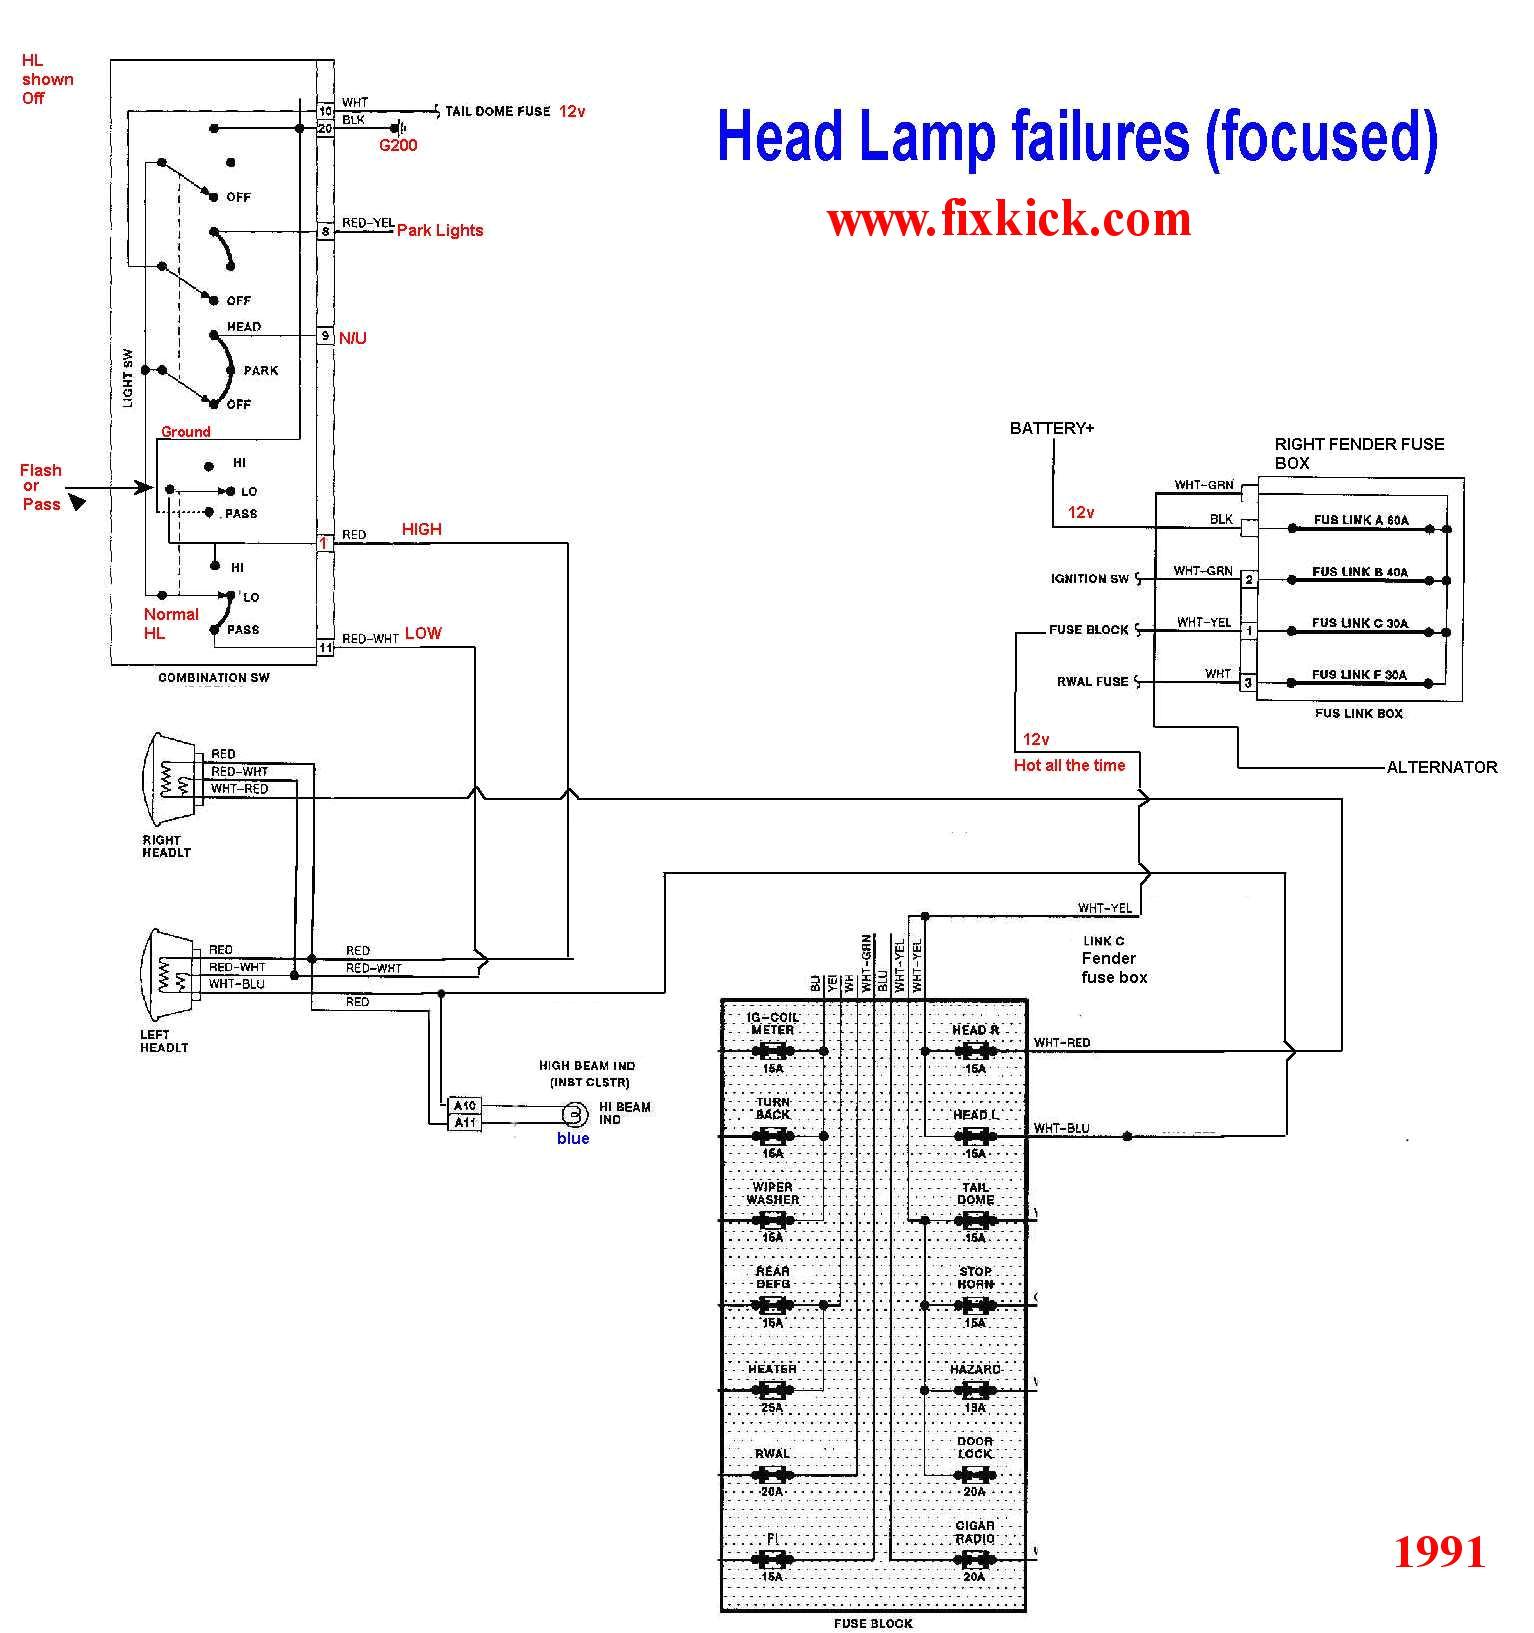 95 geo tracker wire diagram wiring diagram sys 95 geo tracker wire diagram wiring diagrams second